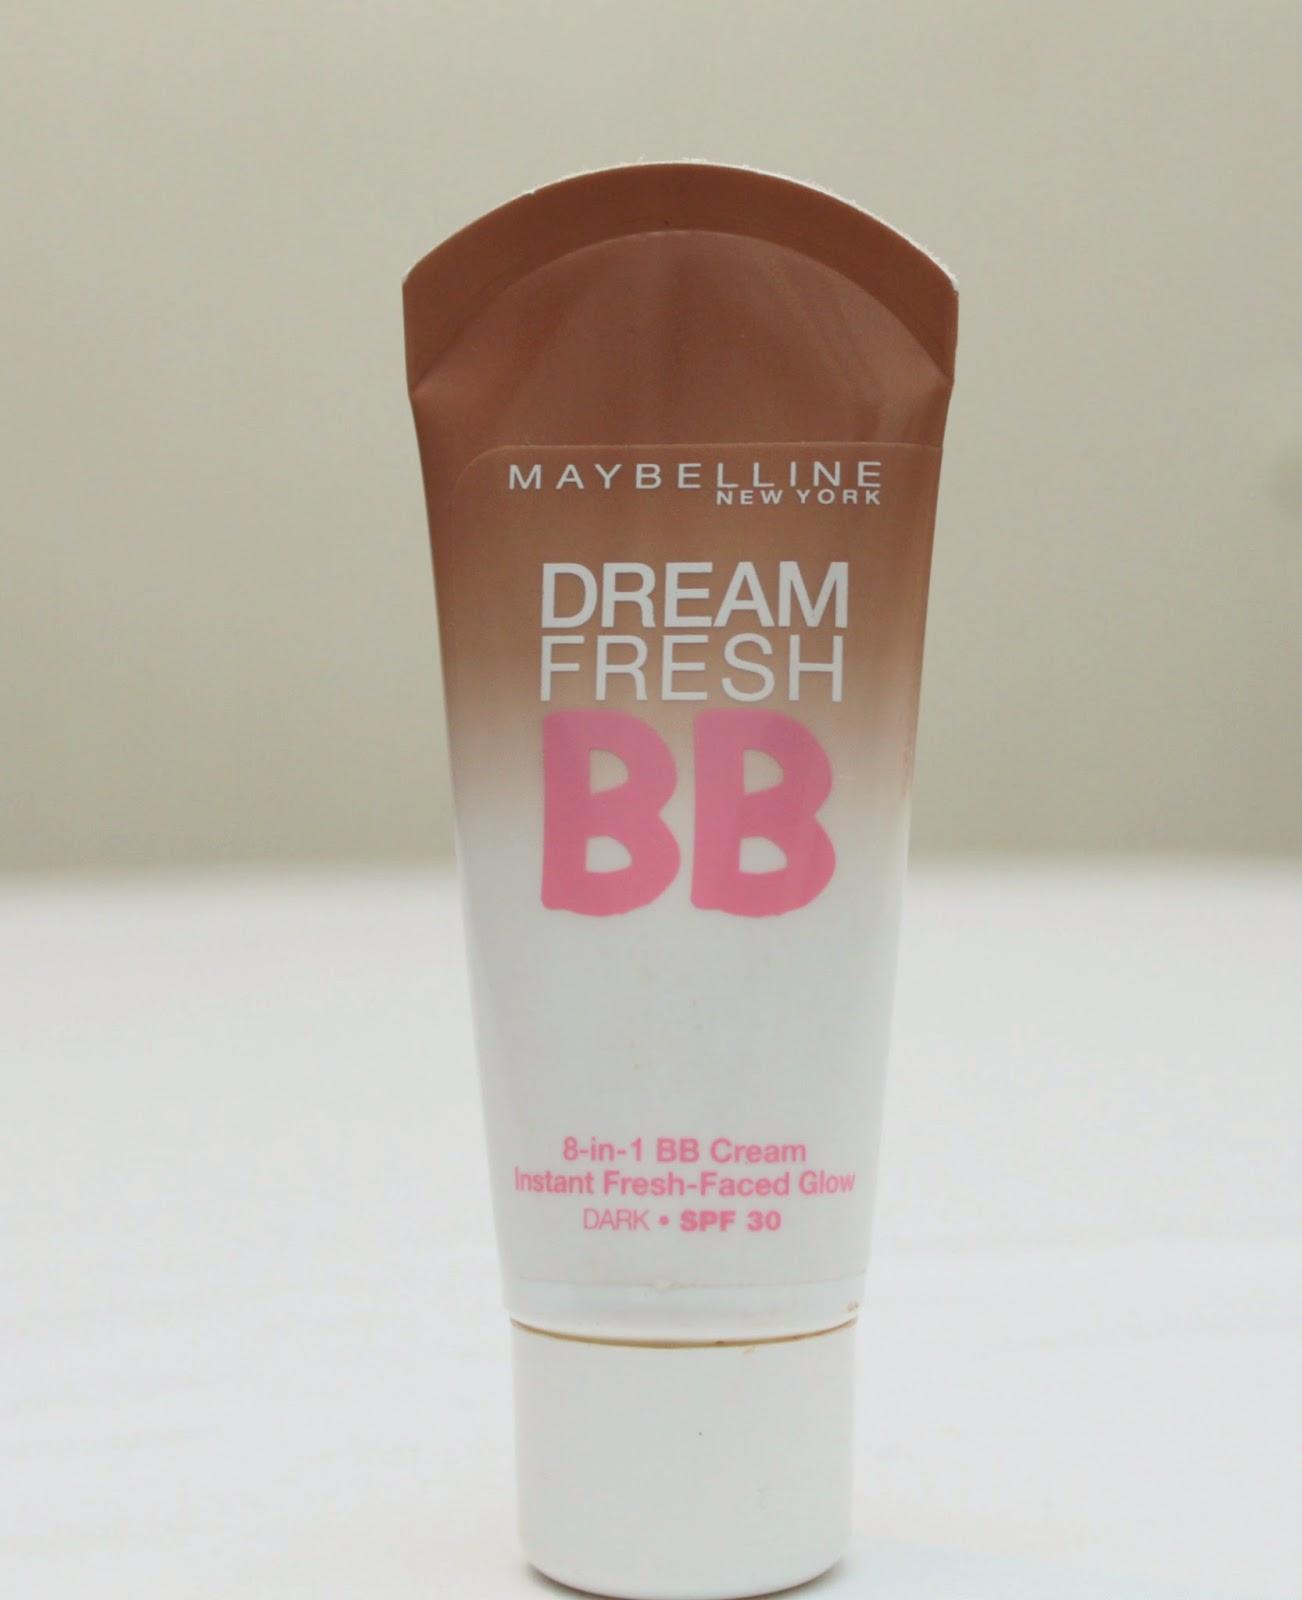 MAYBELLINE DREAM FRESH BB CREAM  IN DARK